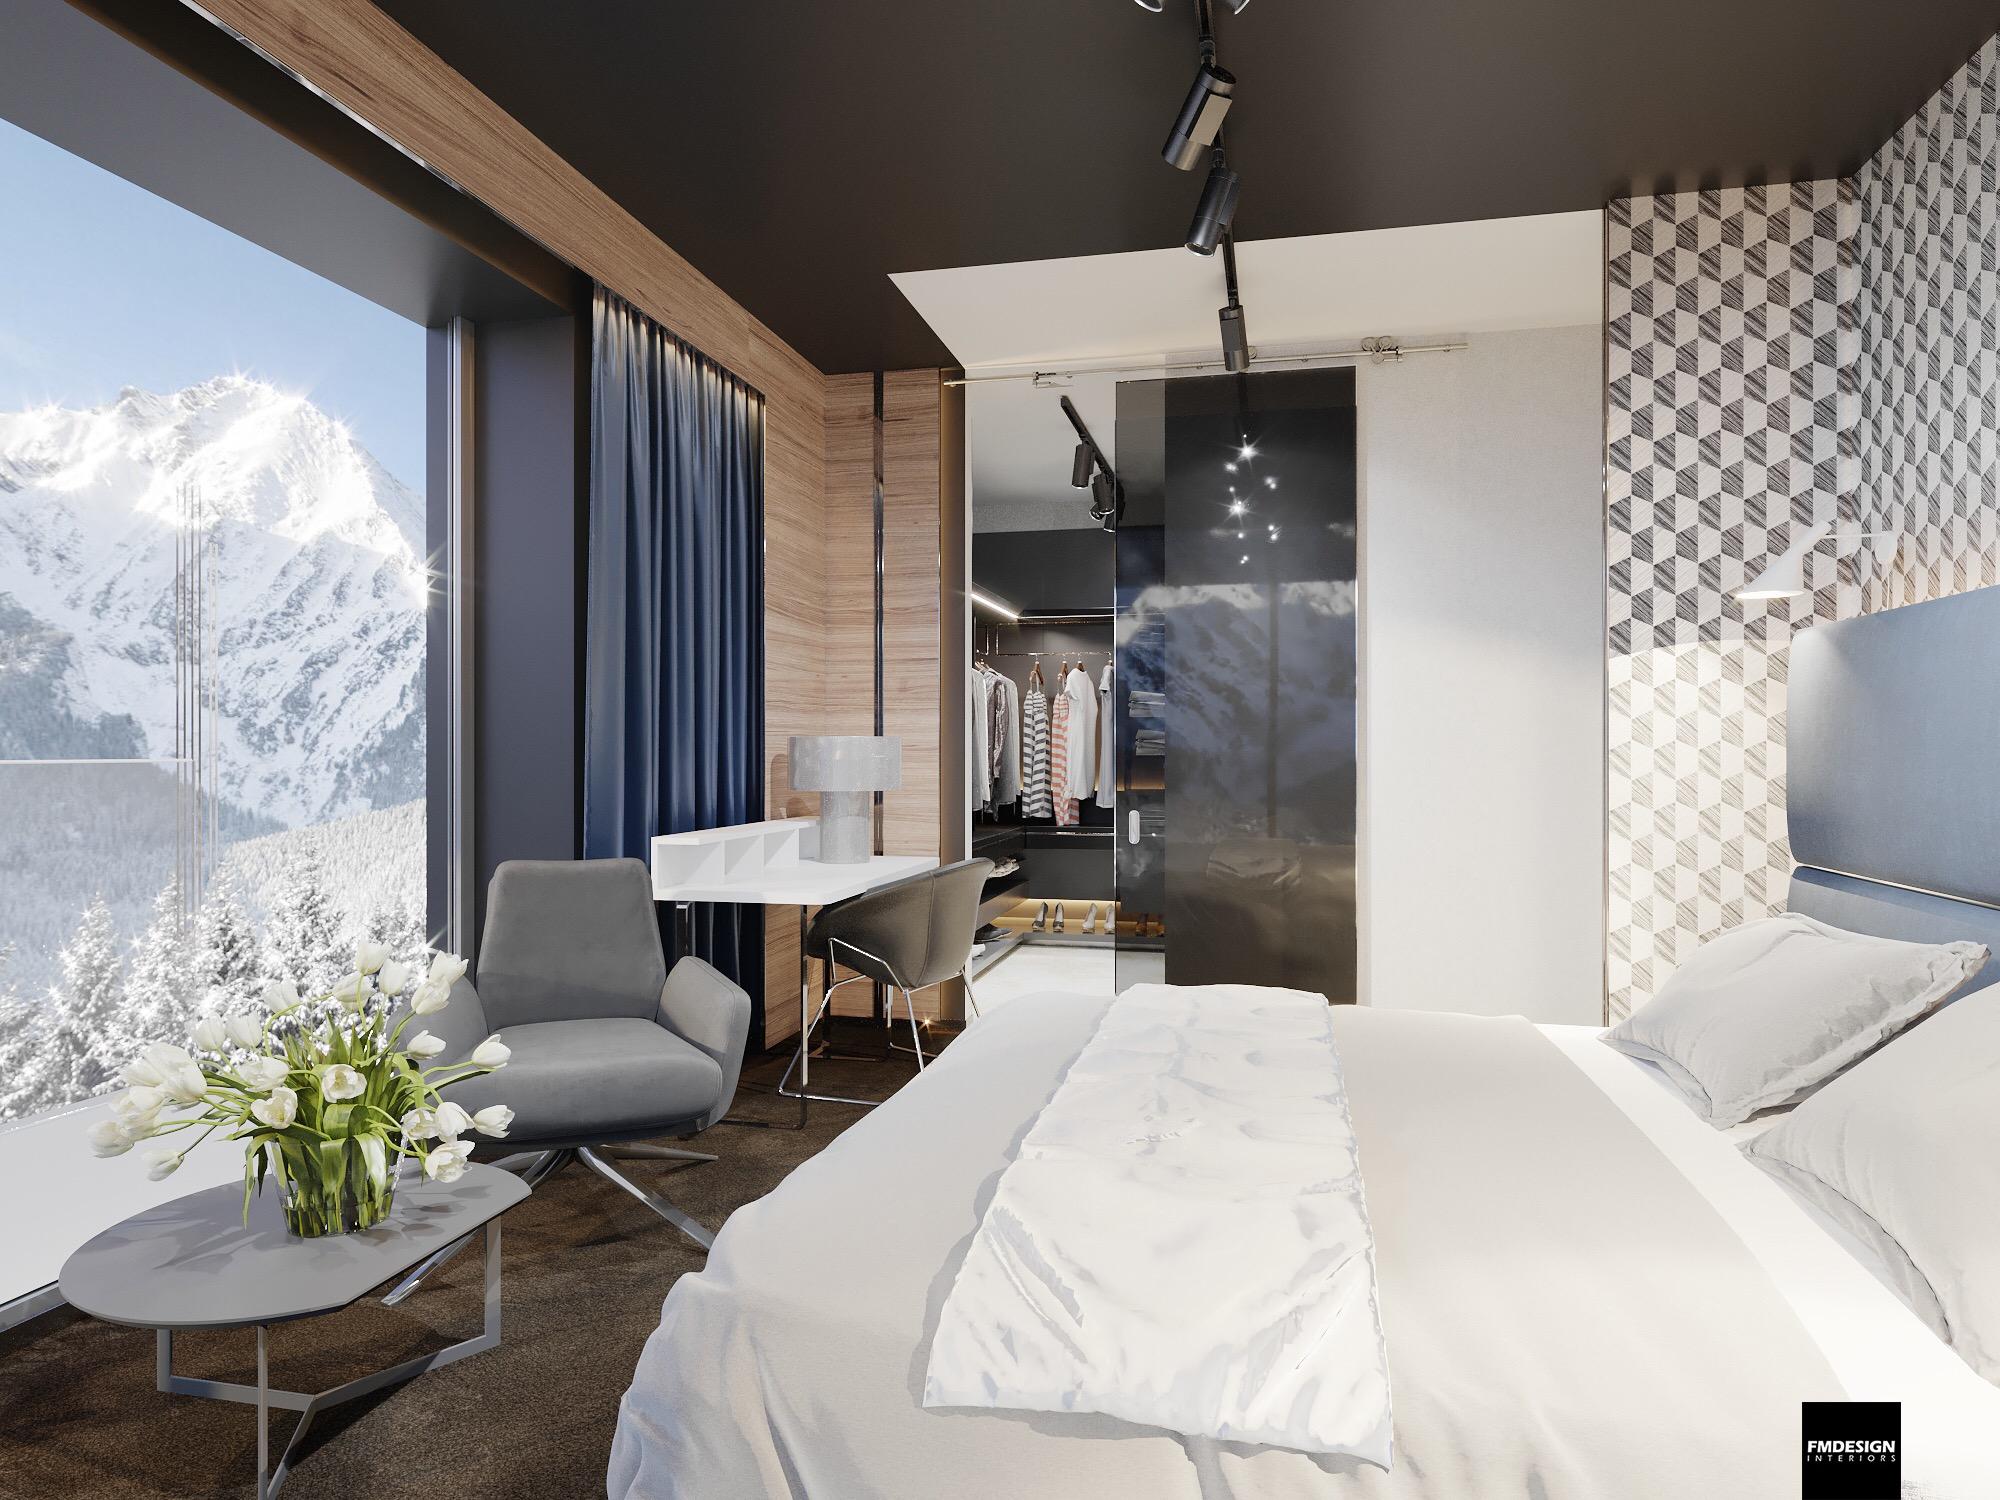 dizajn apartmanu hotelovy nabytok (10)